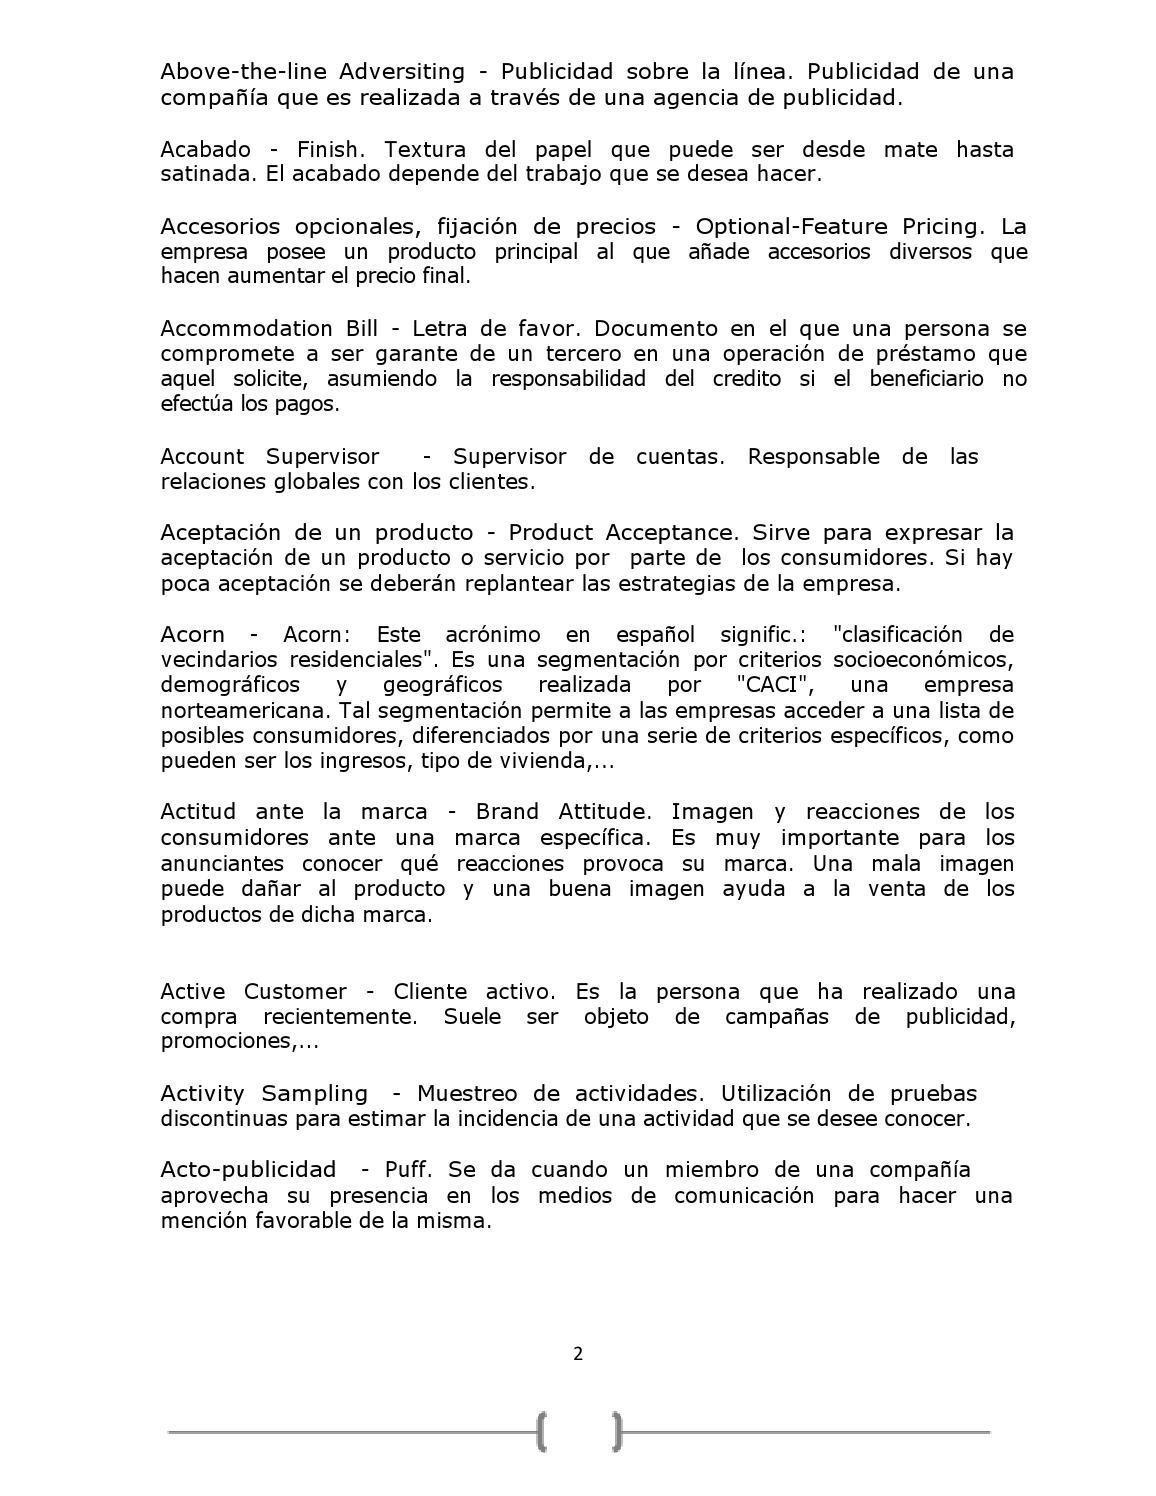 Diccionario de marketing by Daniel Gonzalez - issuu